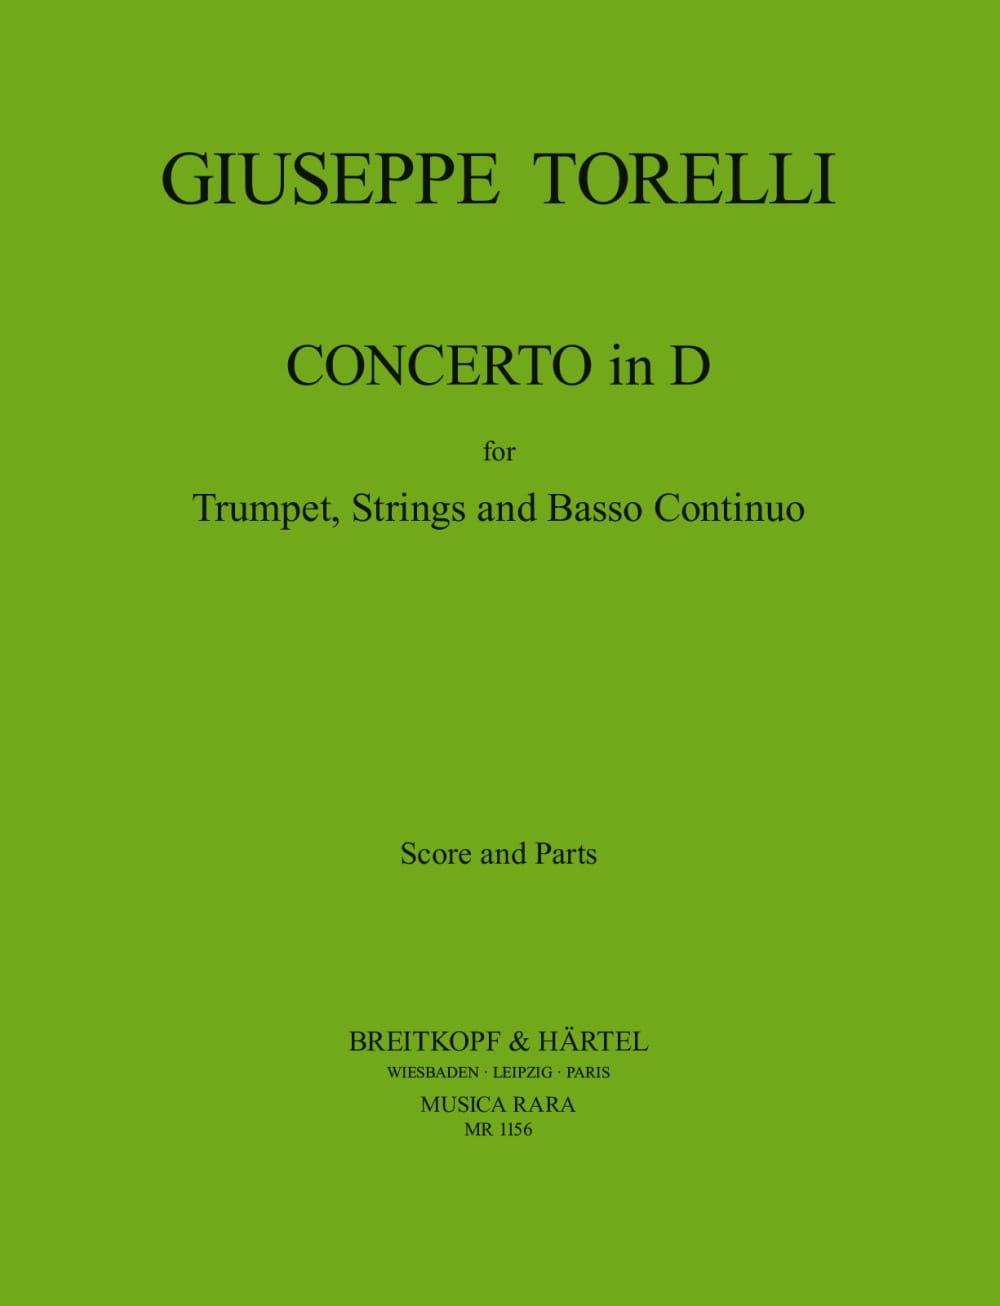 Concerto In D - Partitur + Stimmen - TORELLI - laflutedepan.com